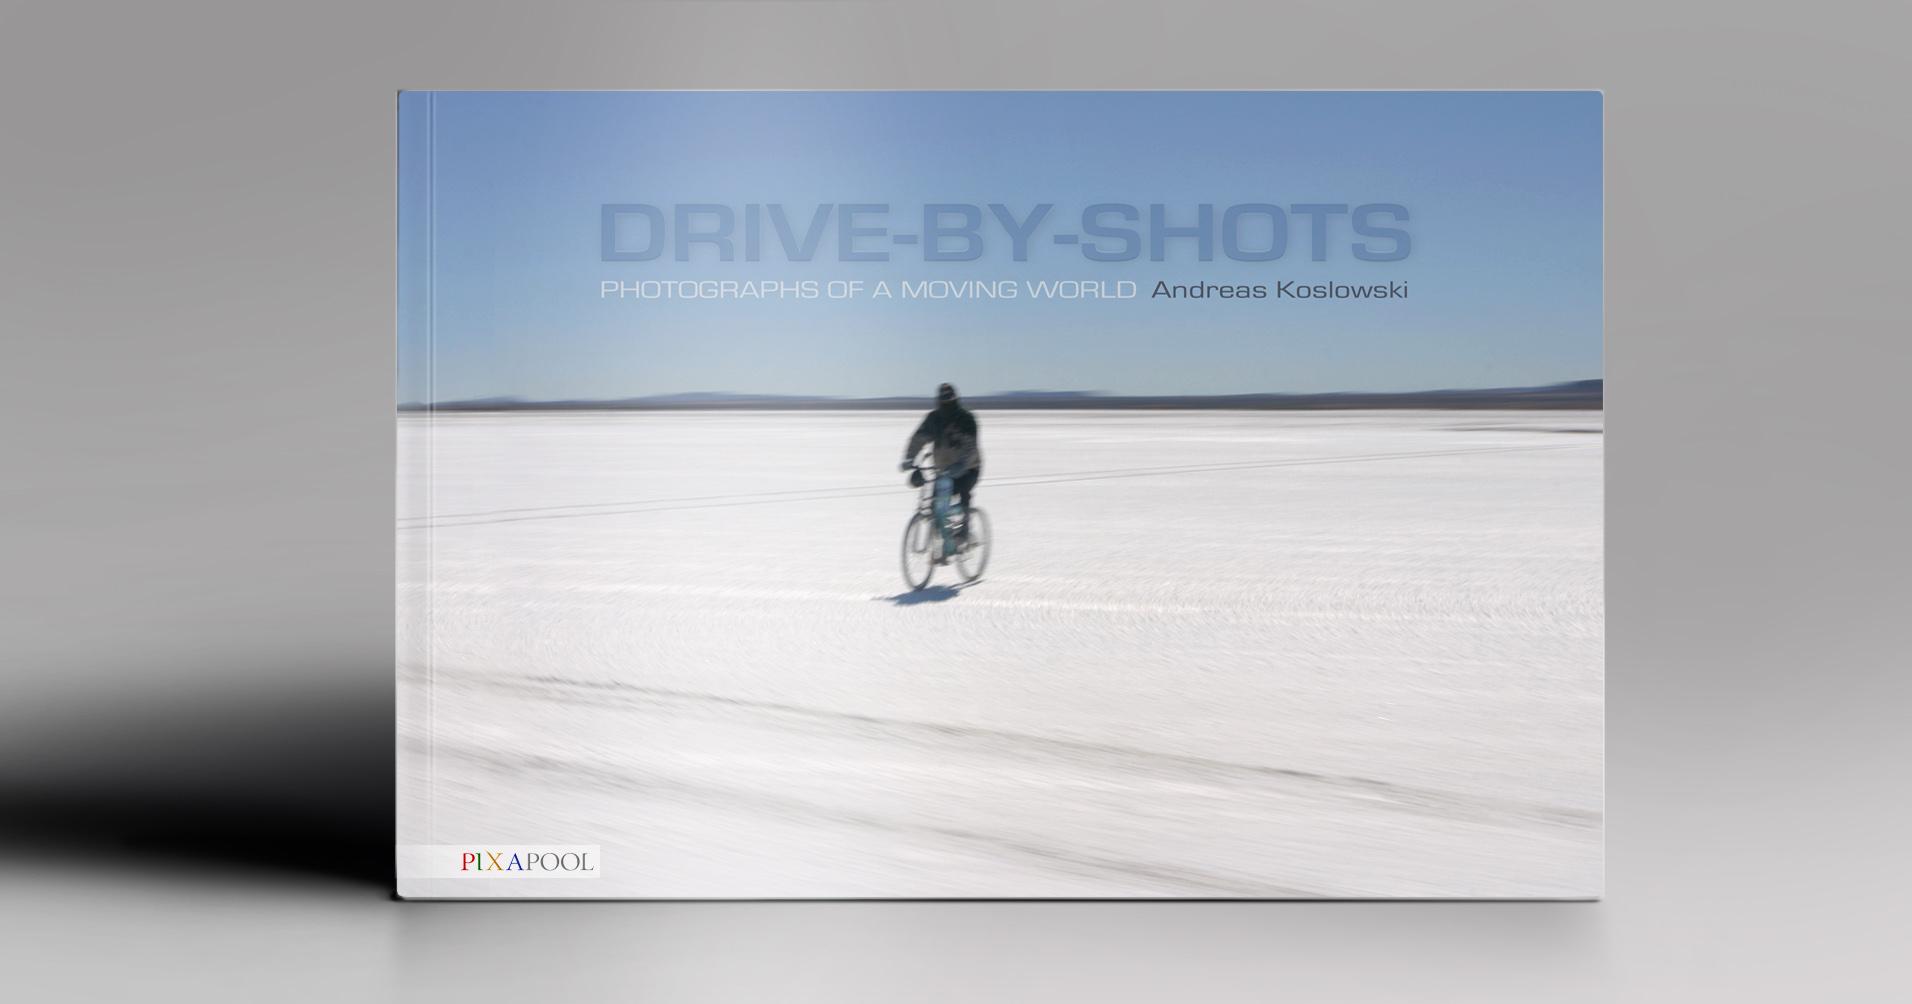 01_titel_drive-by-shots